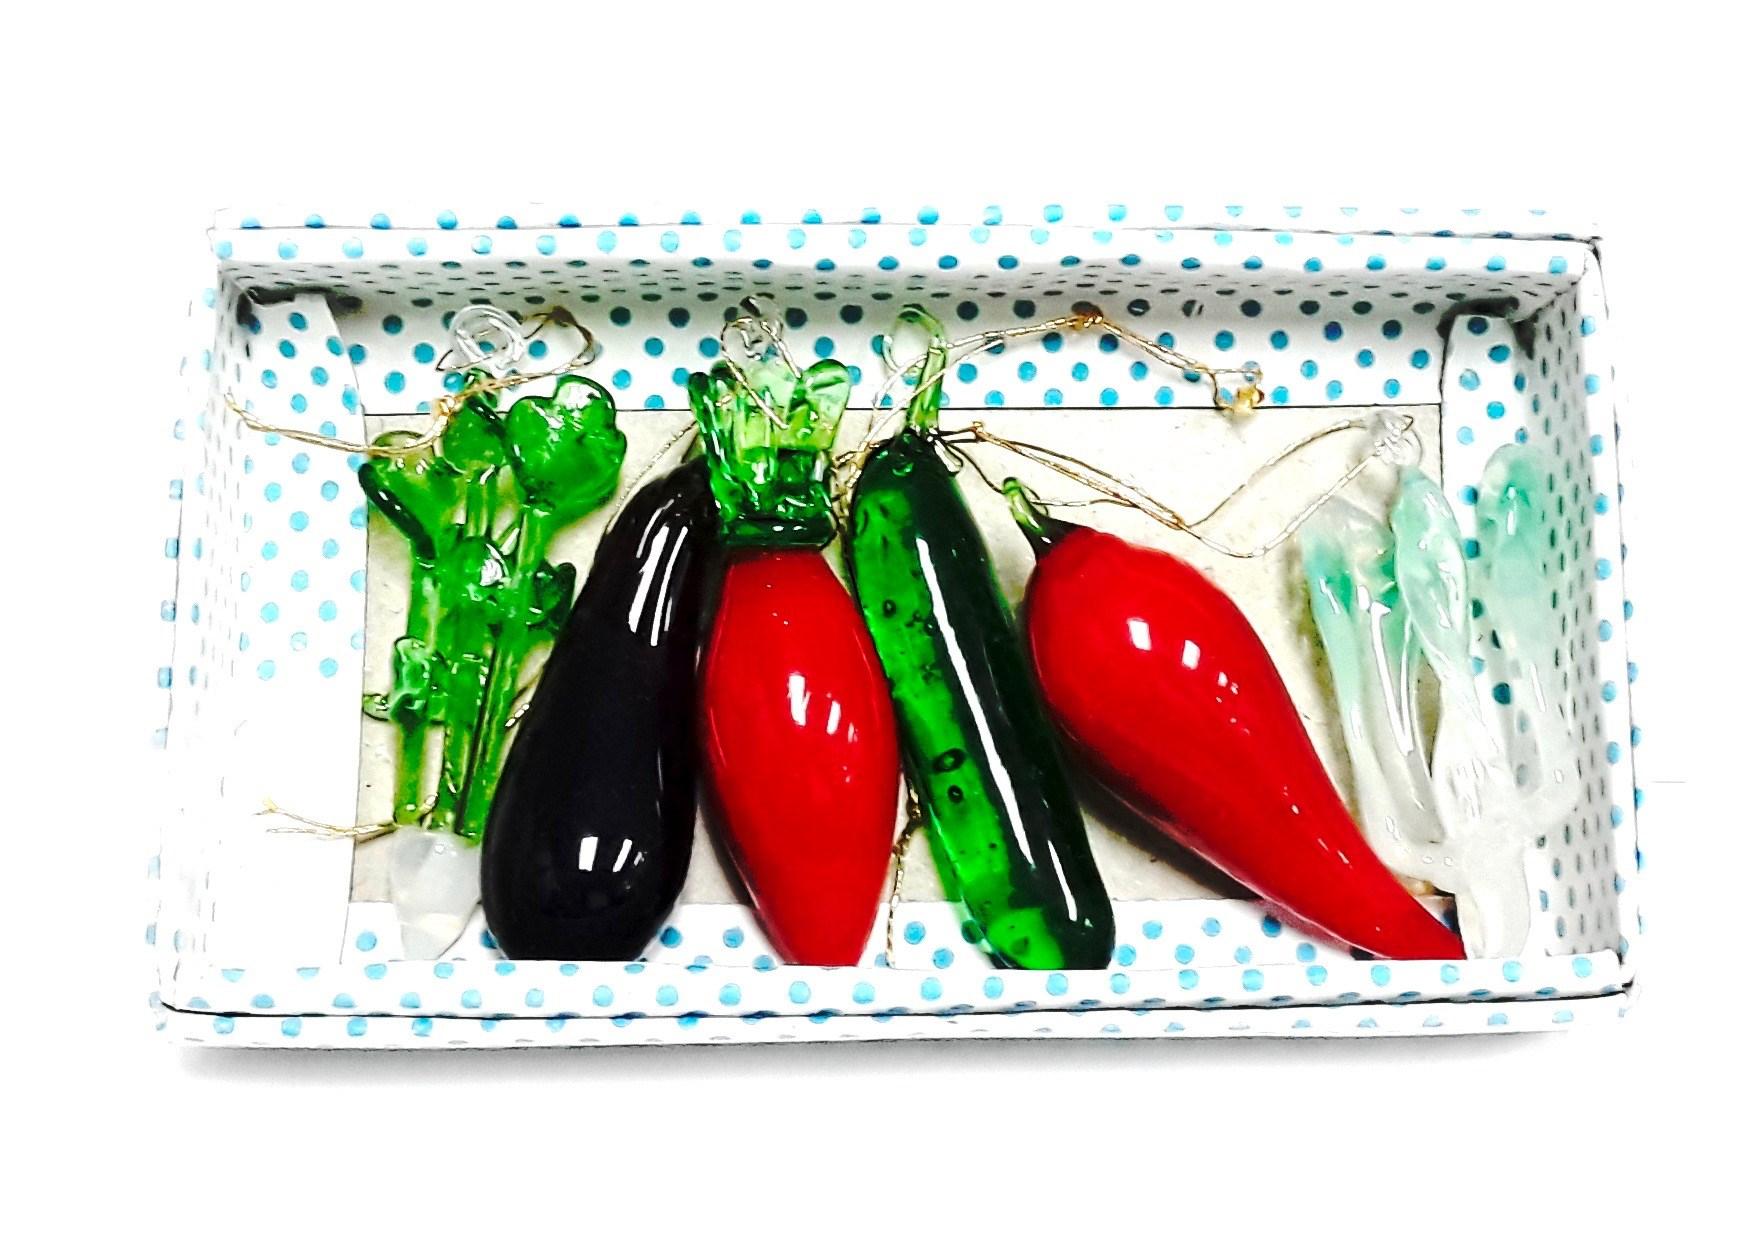 Asst Glass Vegetable 6pcs/set